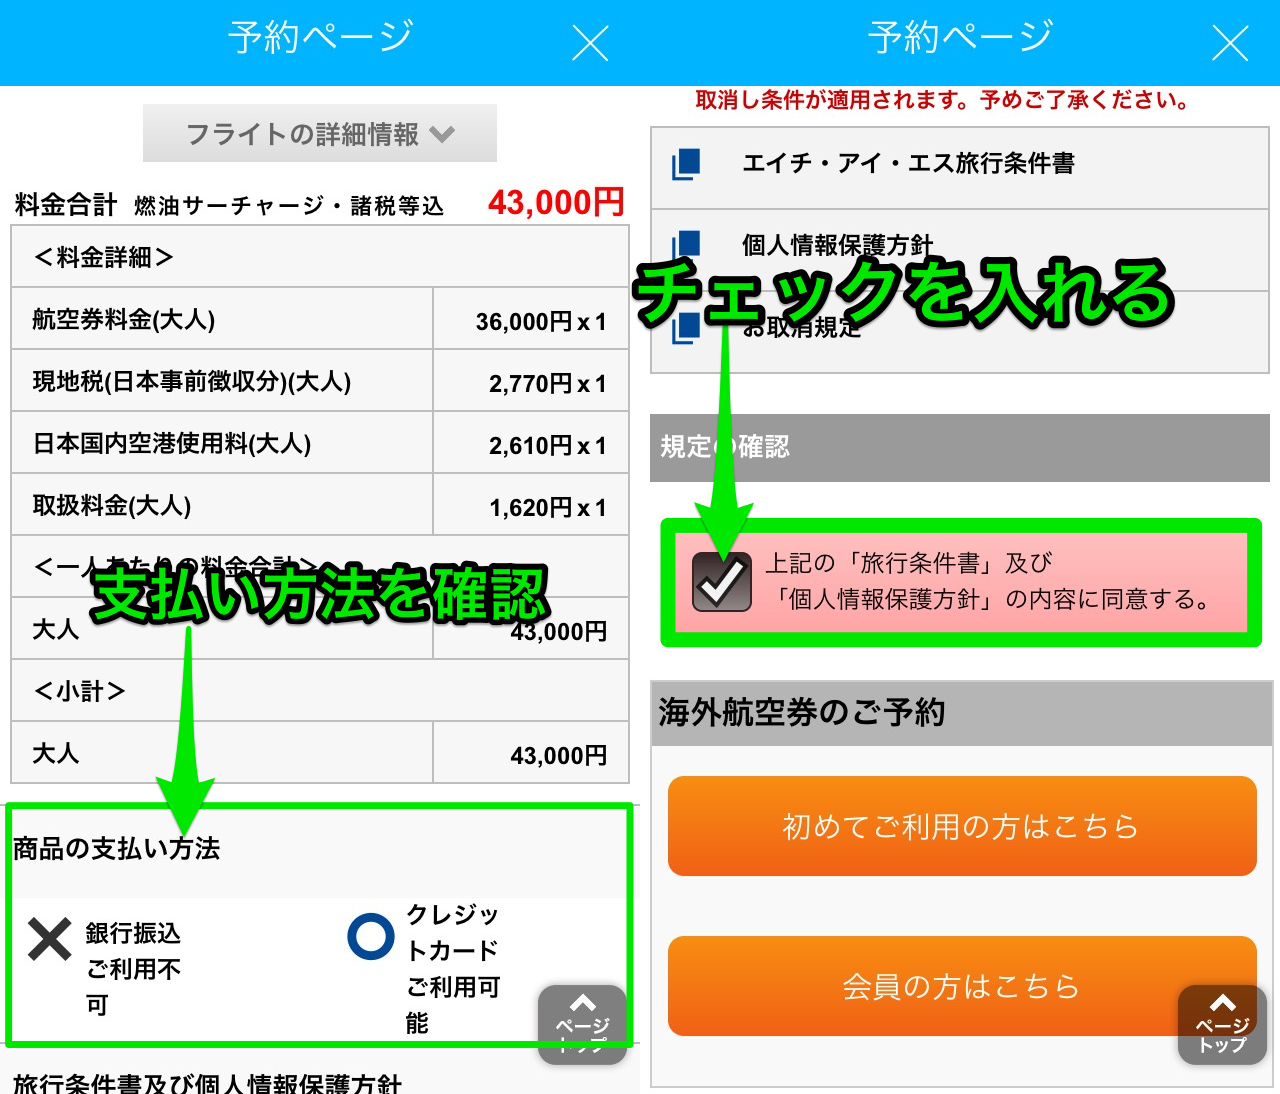 HISアプリ「航空券・ホテル」で支払い方法と内容同意